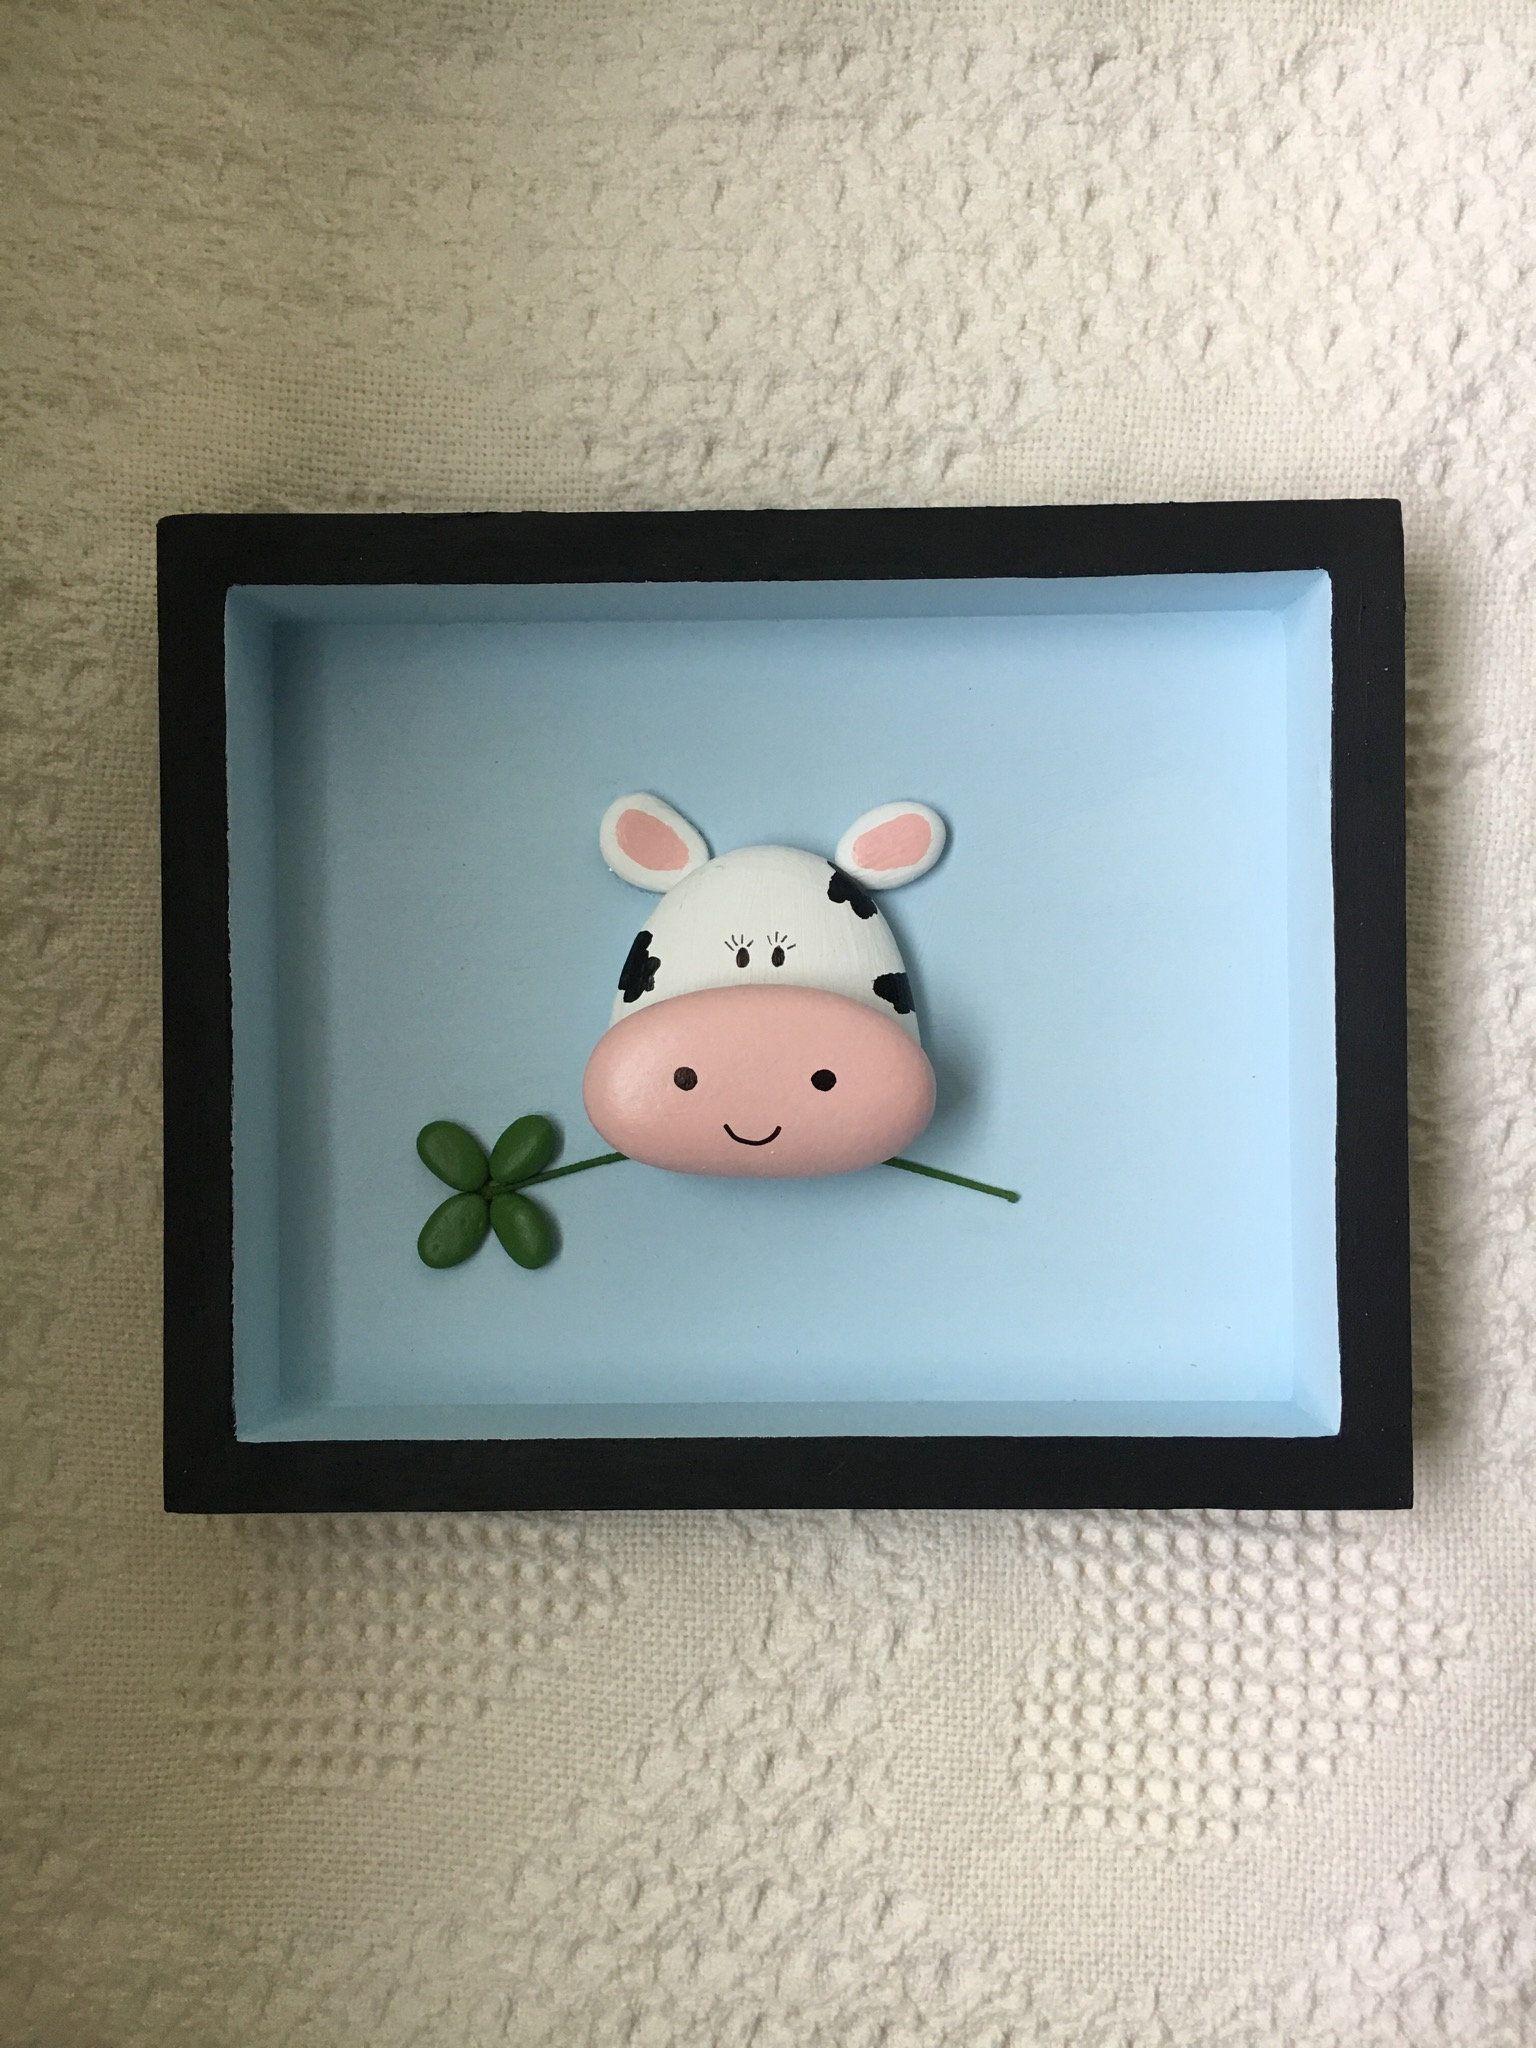 Cow Decor Cow Wall Art Painted Pebble Art Framed Nursery Etsy Cow Decor Cow Wall Art Pebble Art